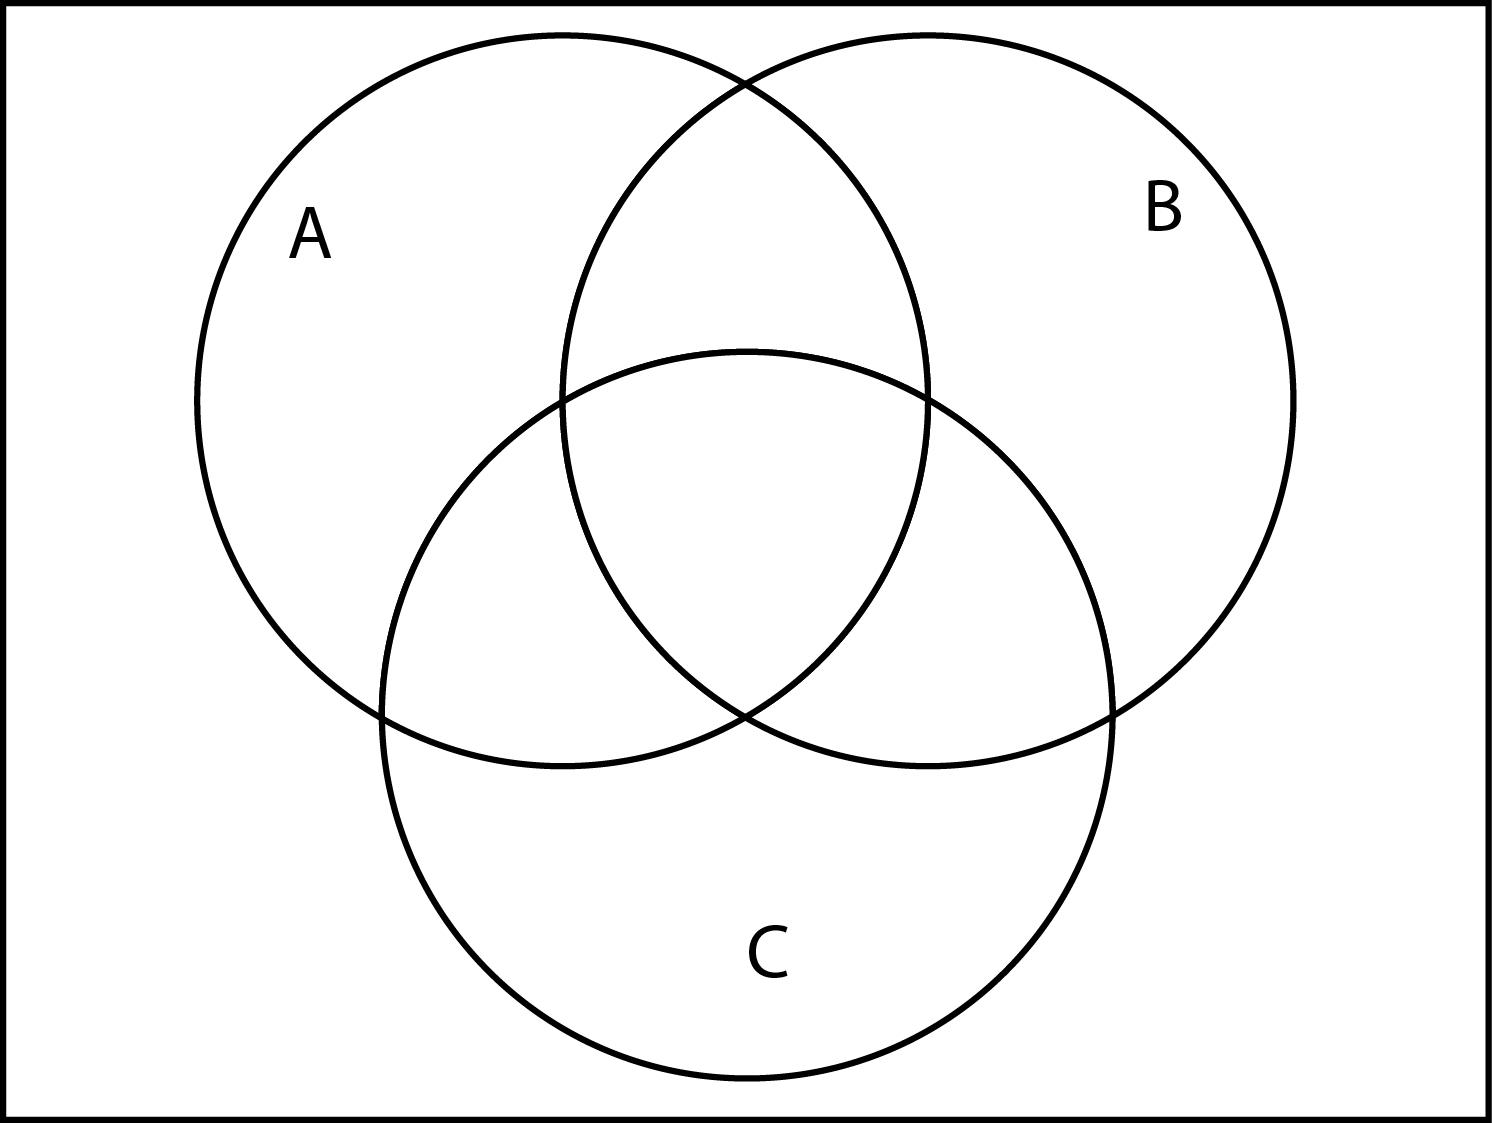 Venn Diagram Template Index Of Johwd63181mat142venn Diagram Templates